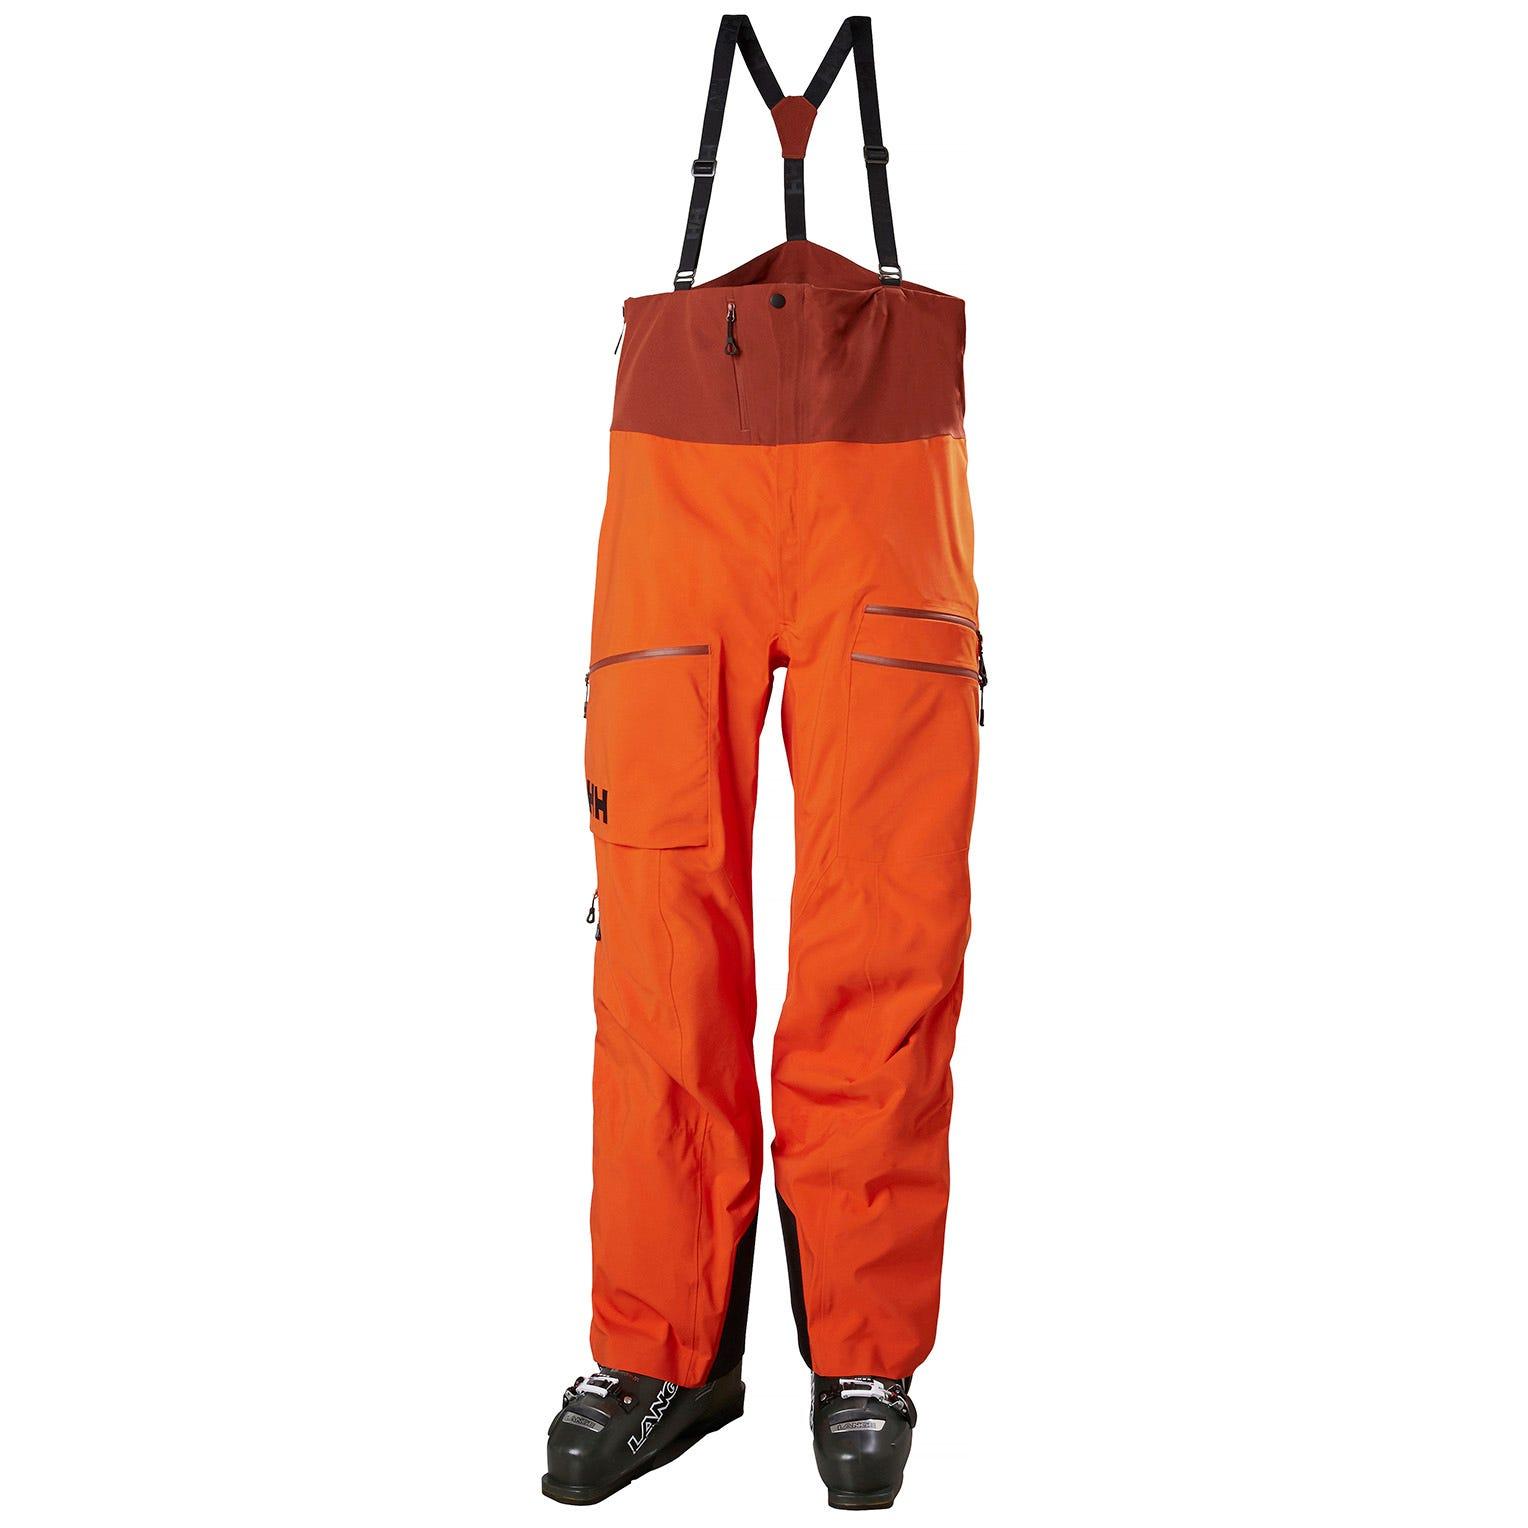 Helly Hansen Mens Odin Mountain 3l Shell Bib Hiking Trouser XL